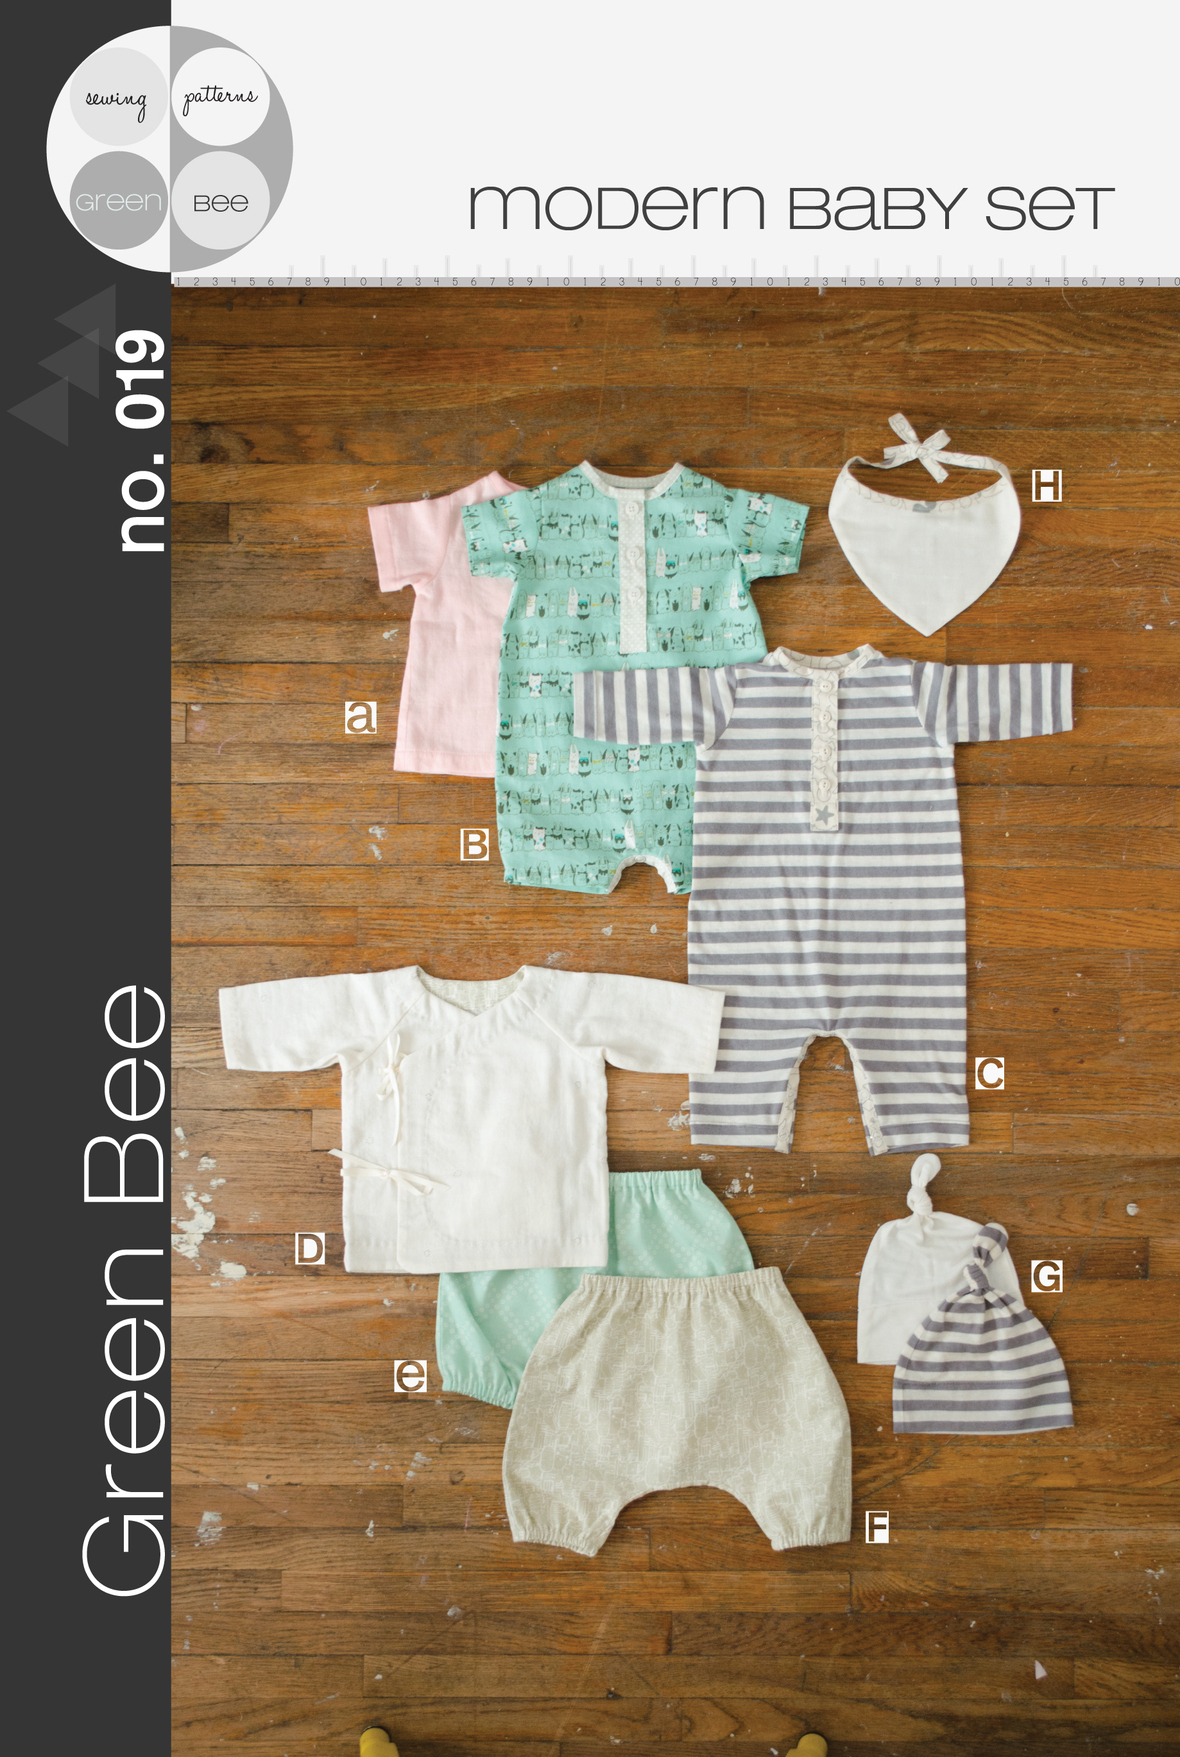 green bee design modern baby set sewing pattern